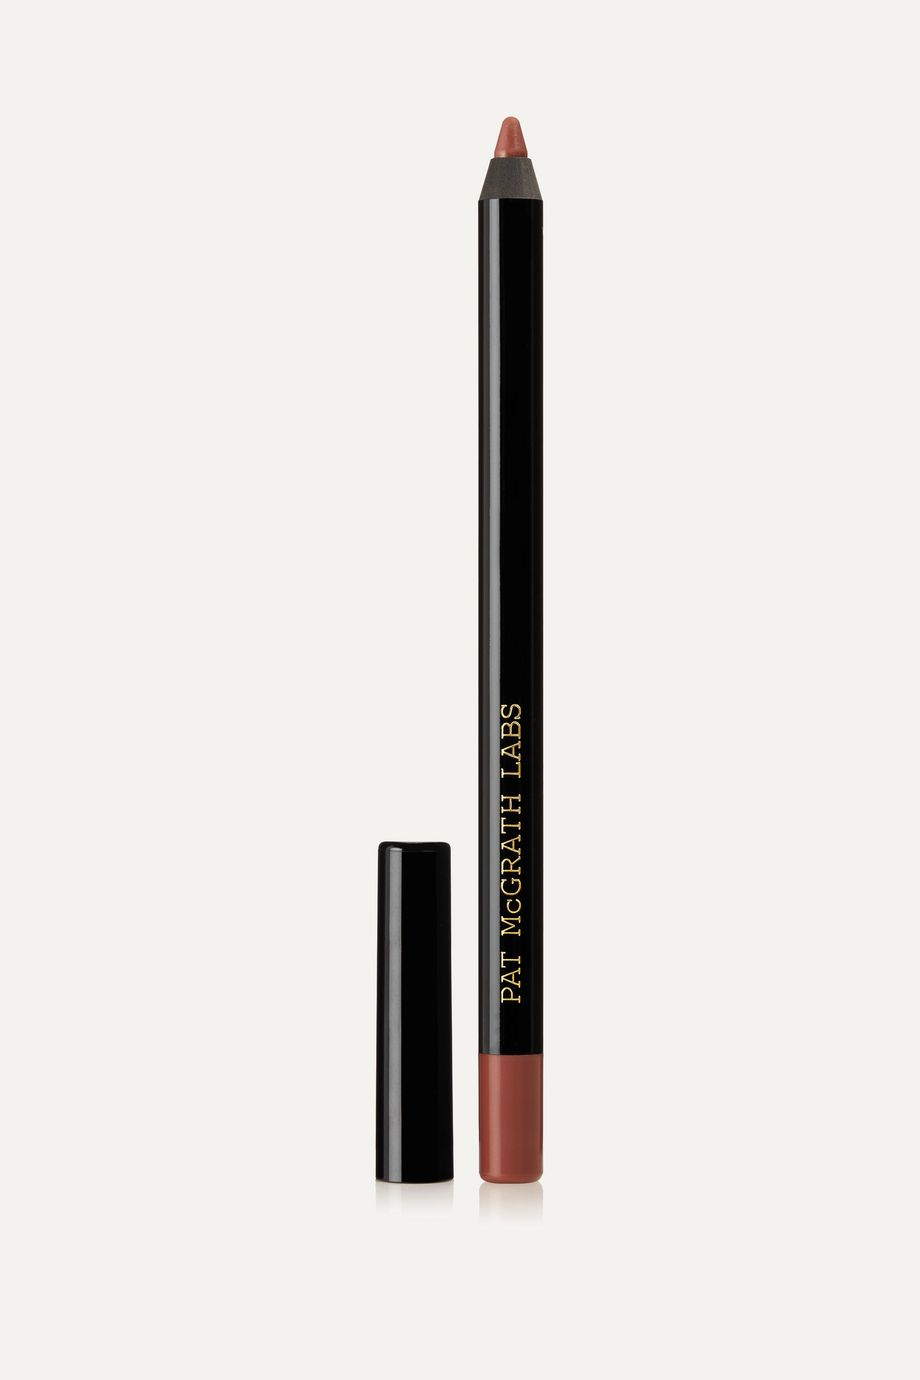 Pat McGrath Labs PermaGel Ultra Lip Pencil - Done Undone